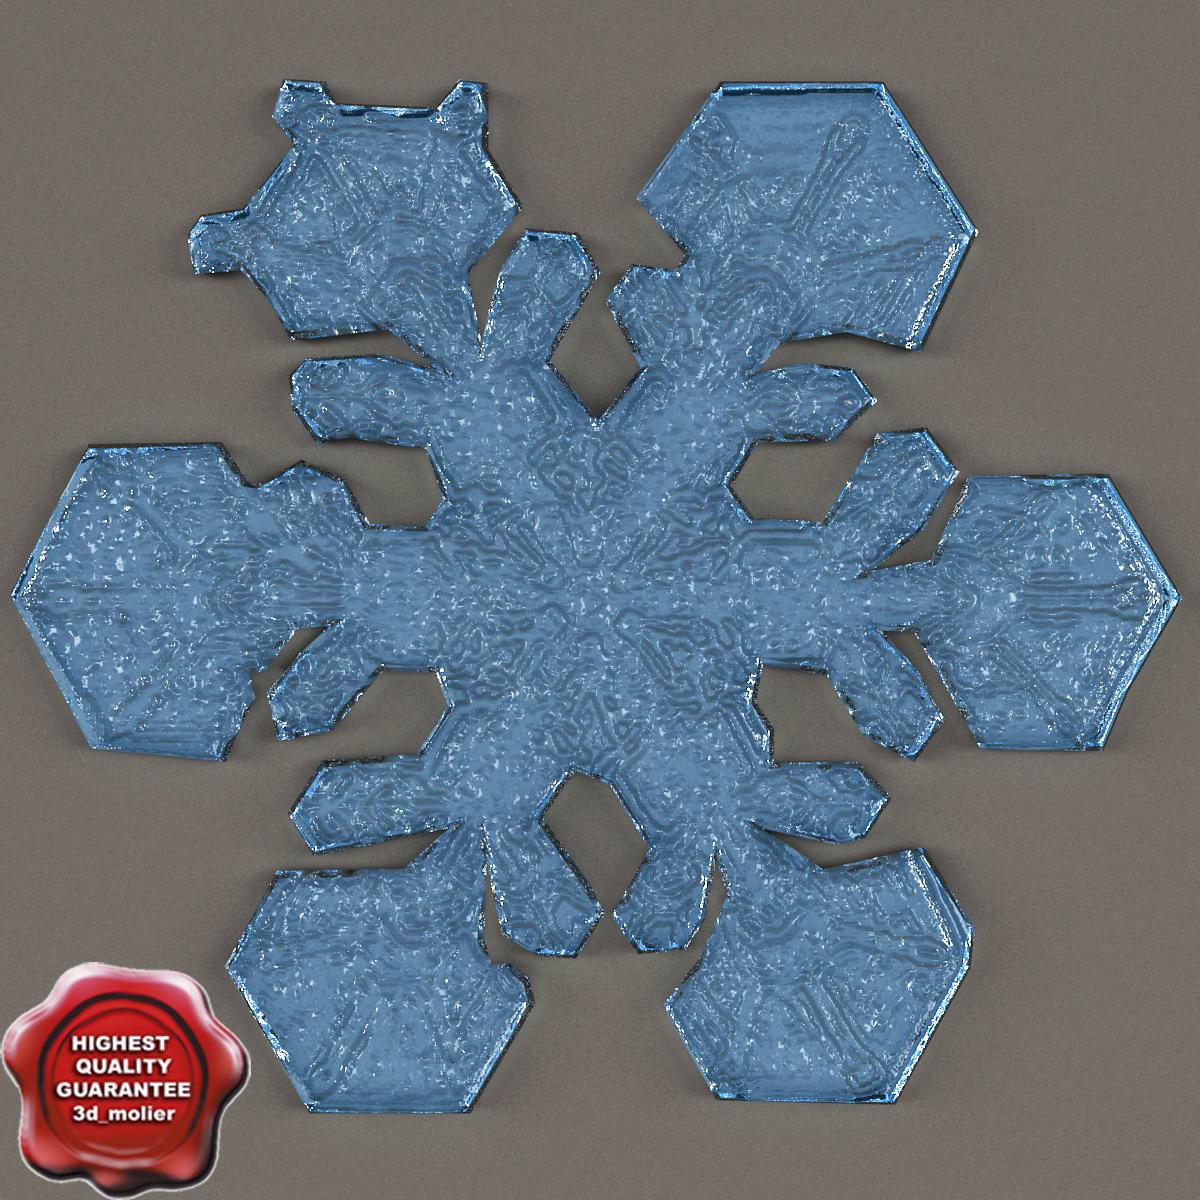 Snowflake_V1_0.jpg